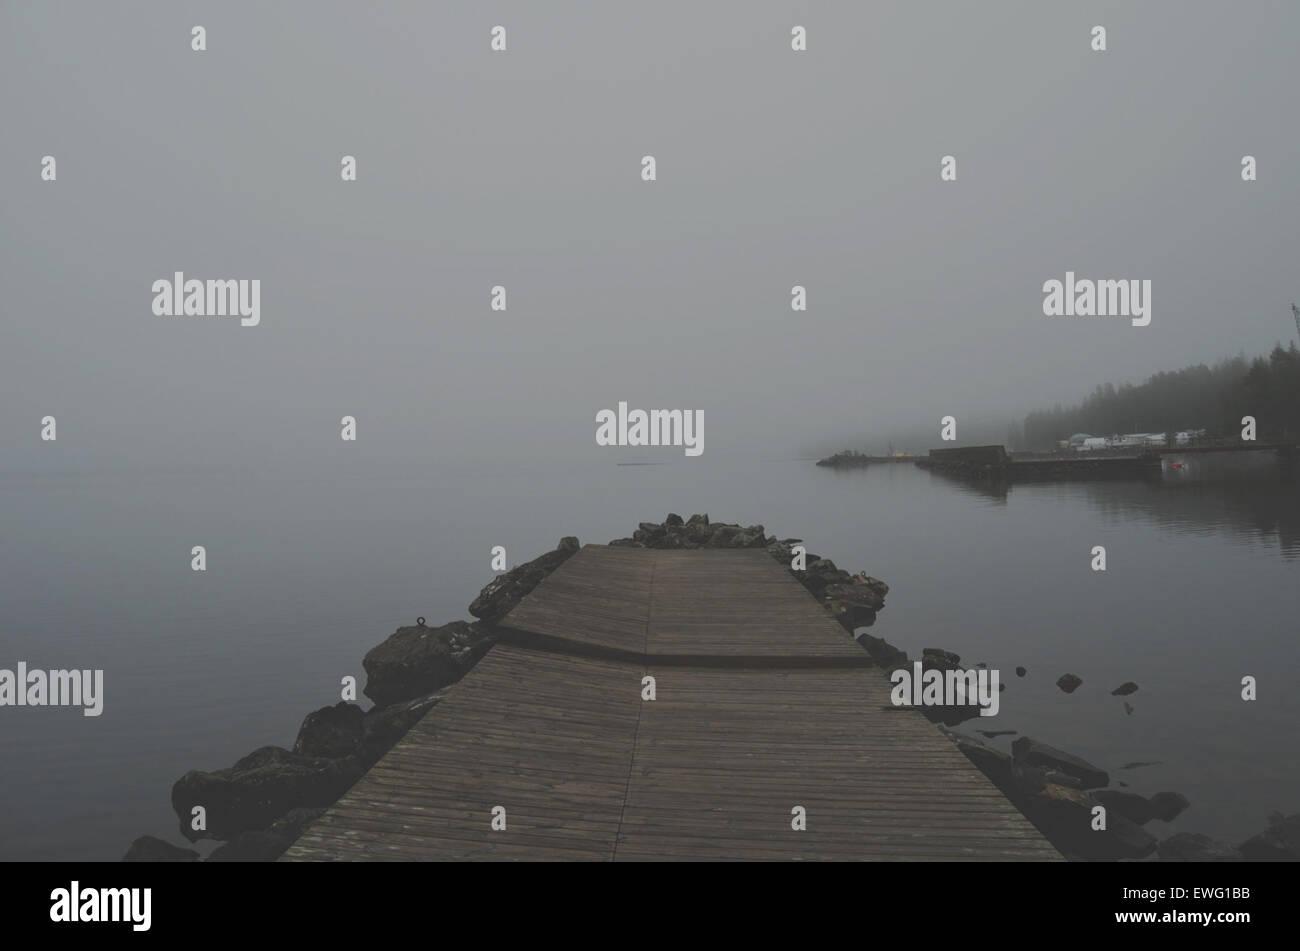 Misty Plank on Lake Ambiguous Cloudy Lake Misty Mysterious Overcast Pier Plank Water haze mist - Stock Image